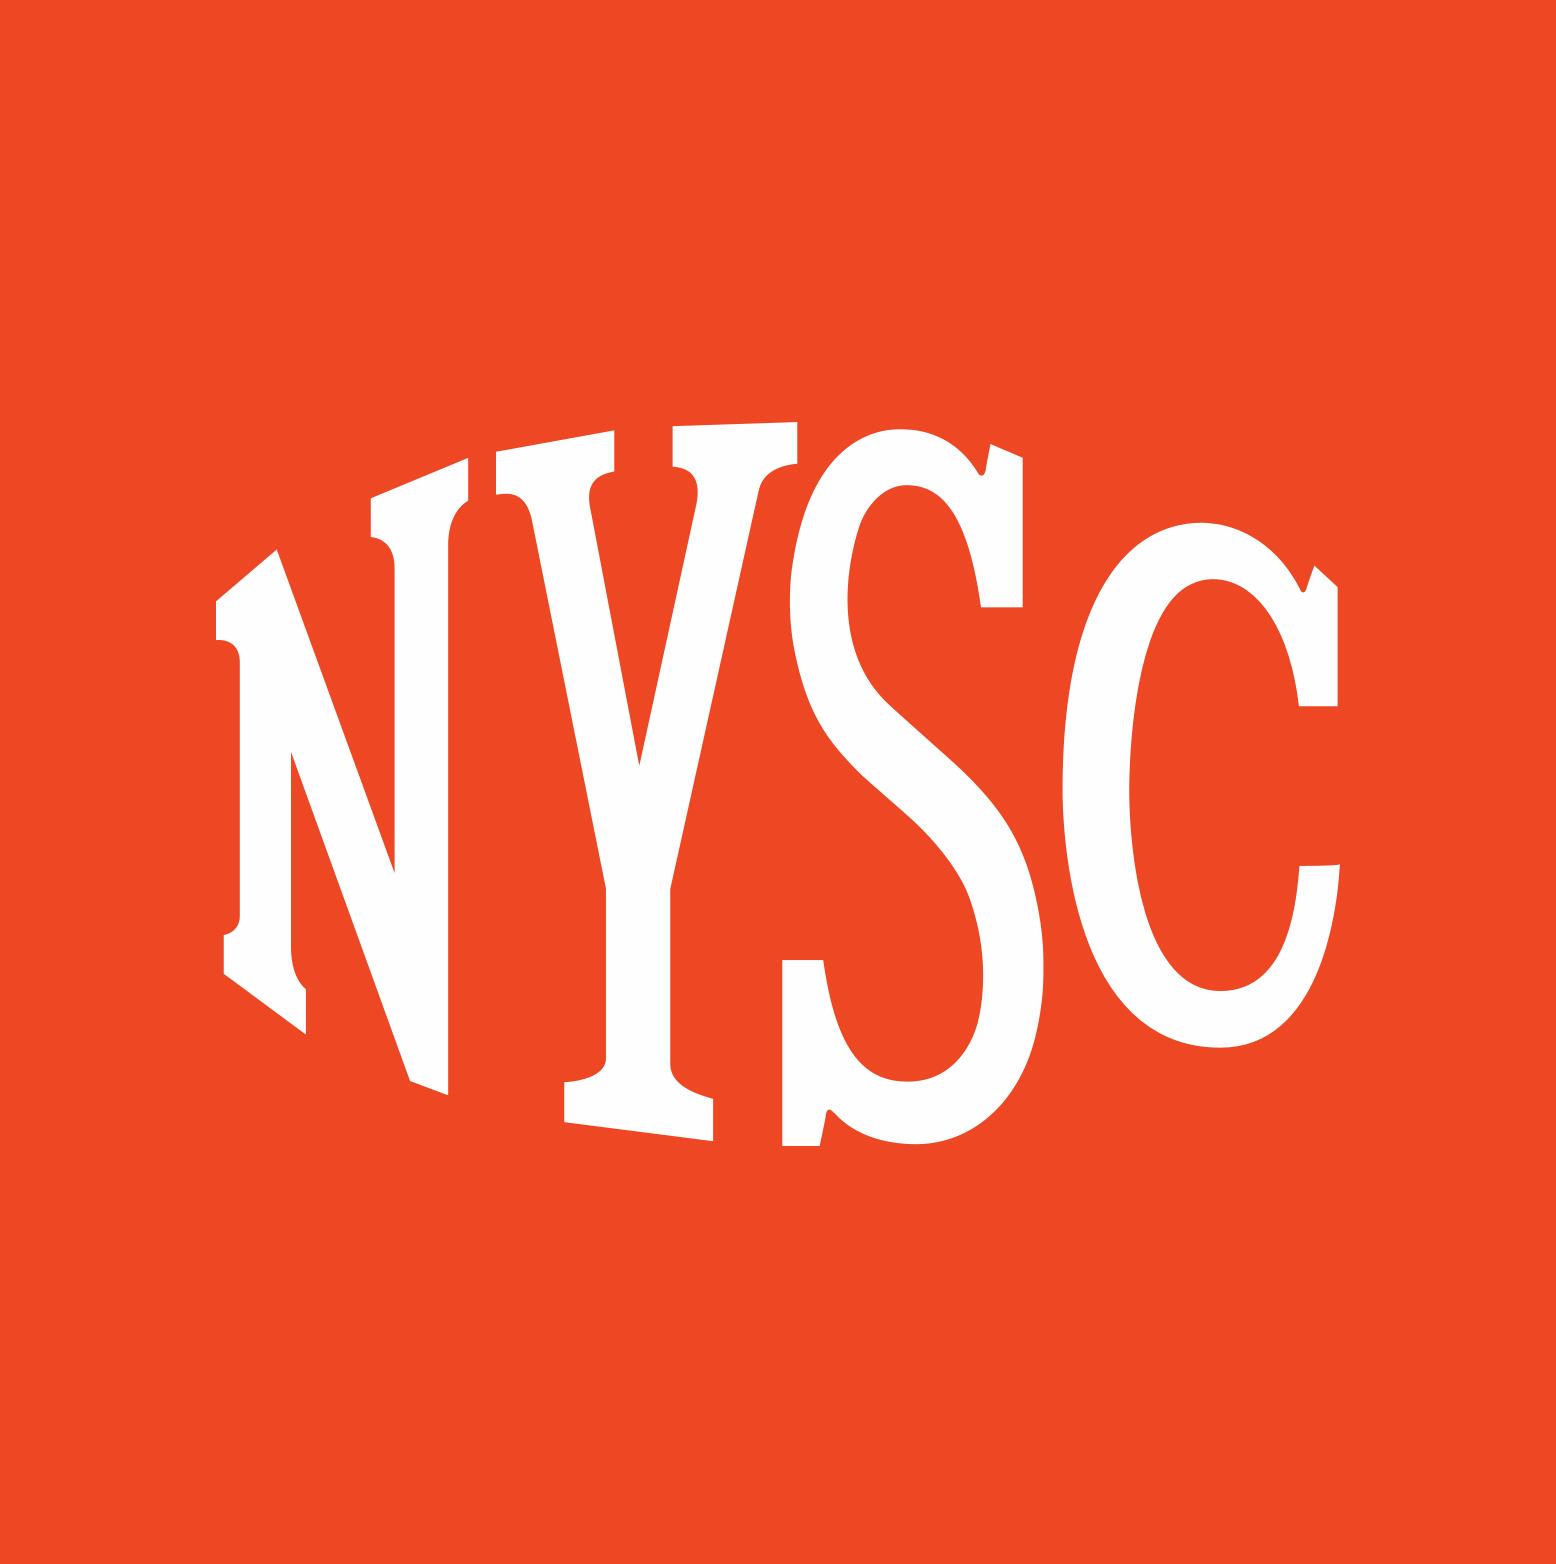 TSI_Logo_NYSC.jpg